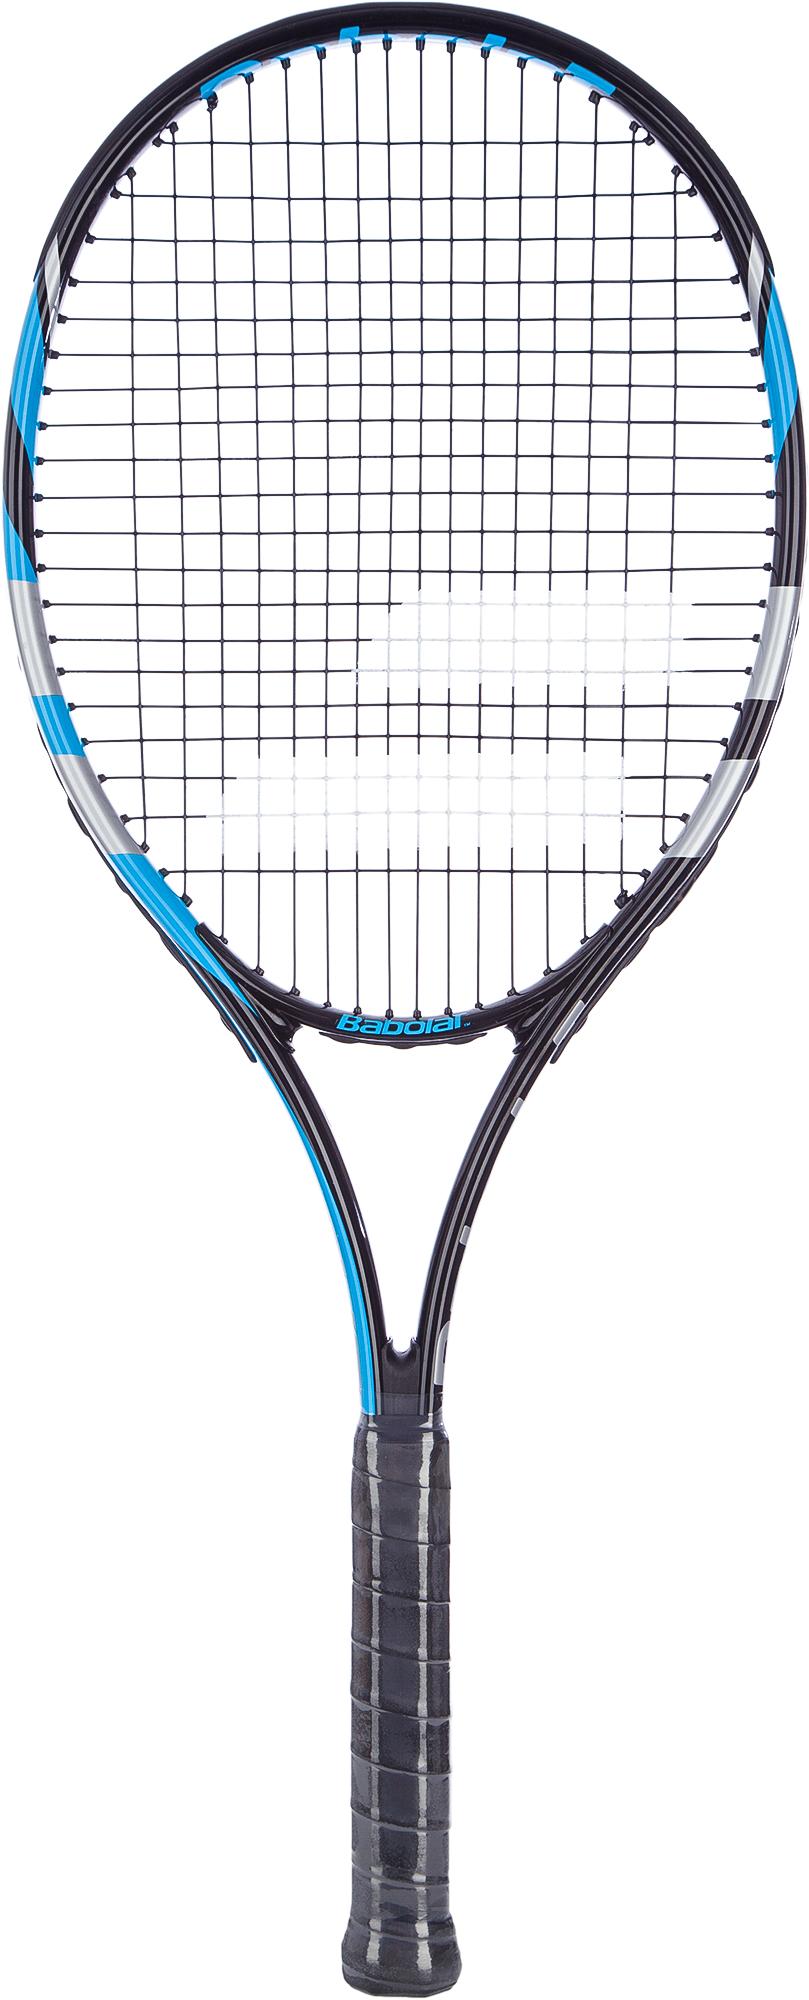 Babolat Ракетка для большого тенниса Babolat Eagle Strung 27